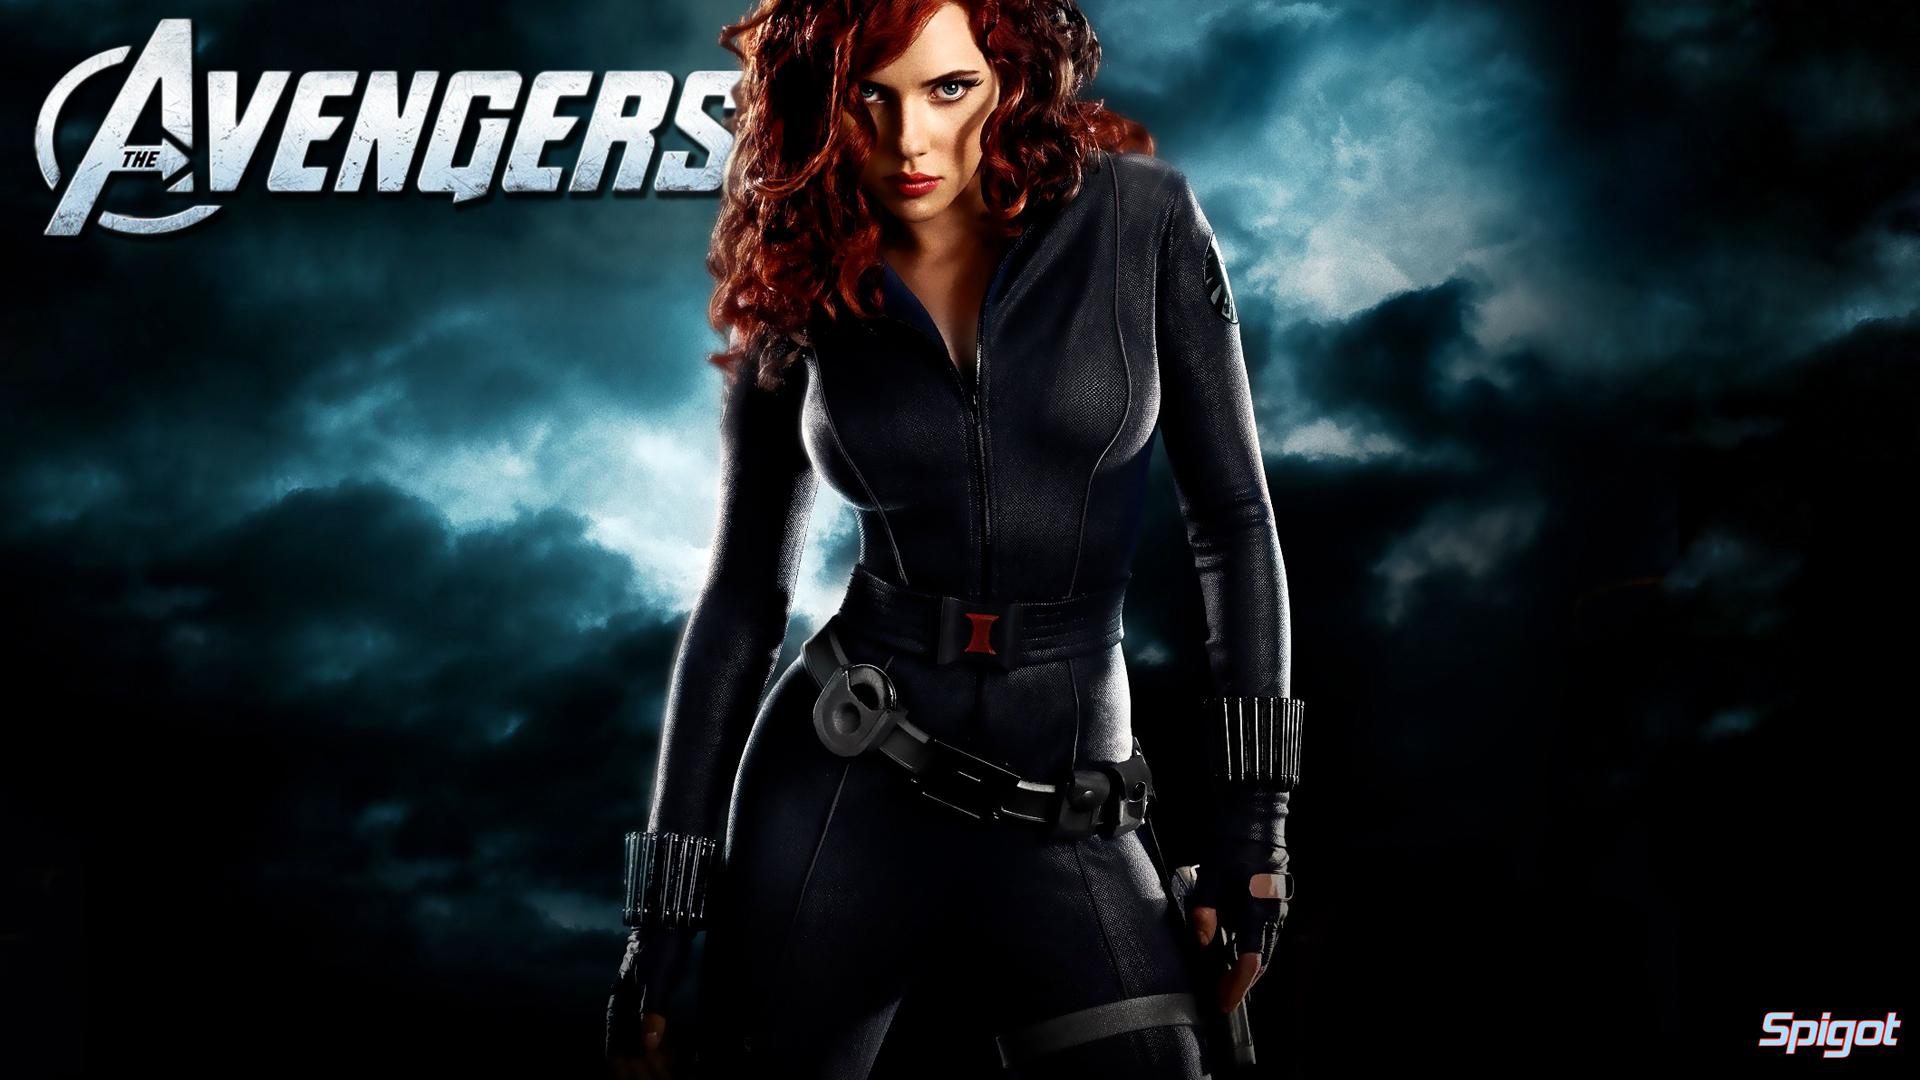 The Avengers Black Widow Wallpaper HD 1920x1080